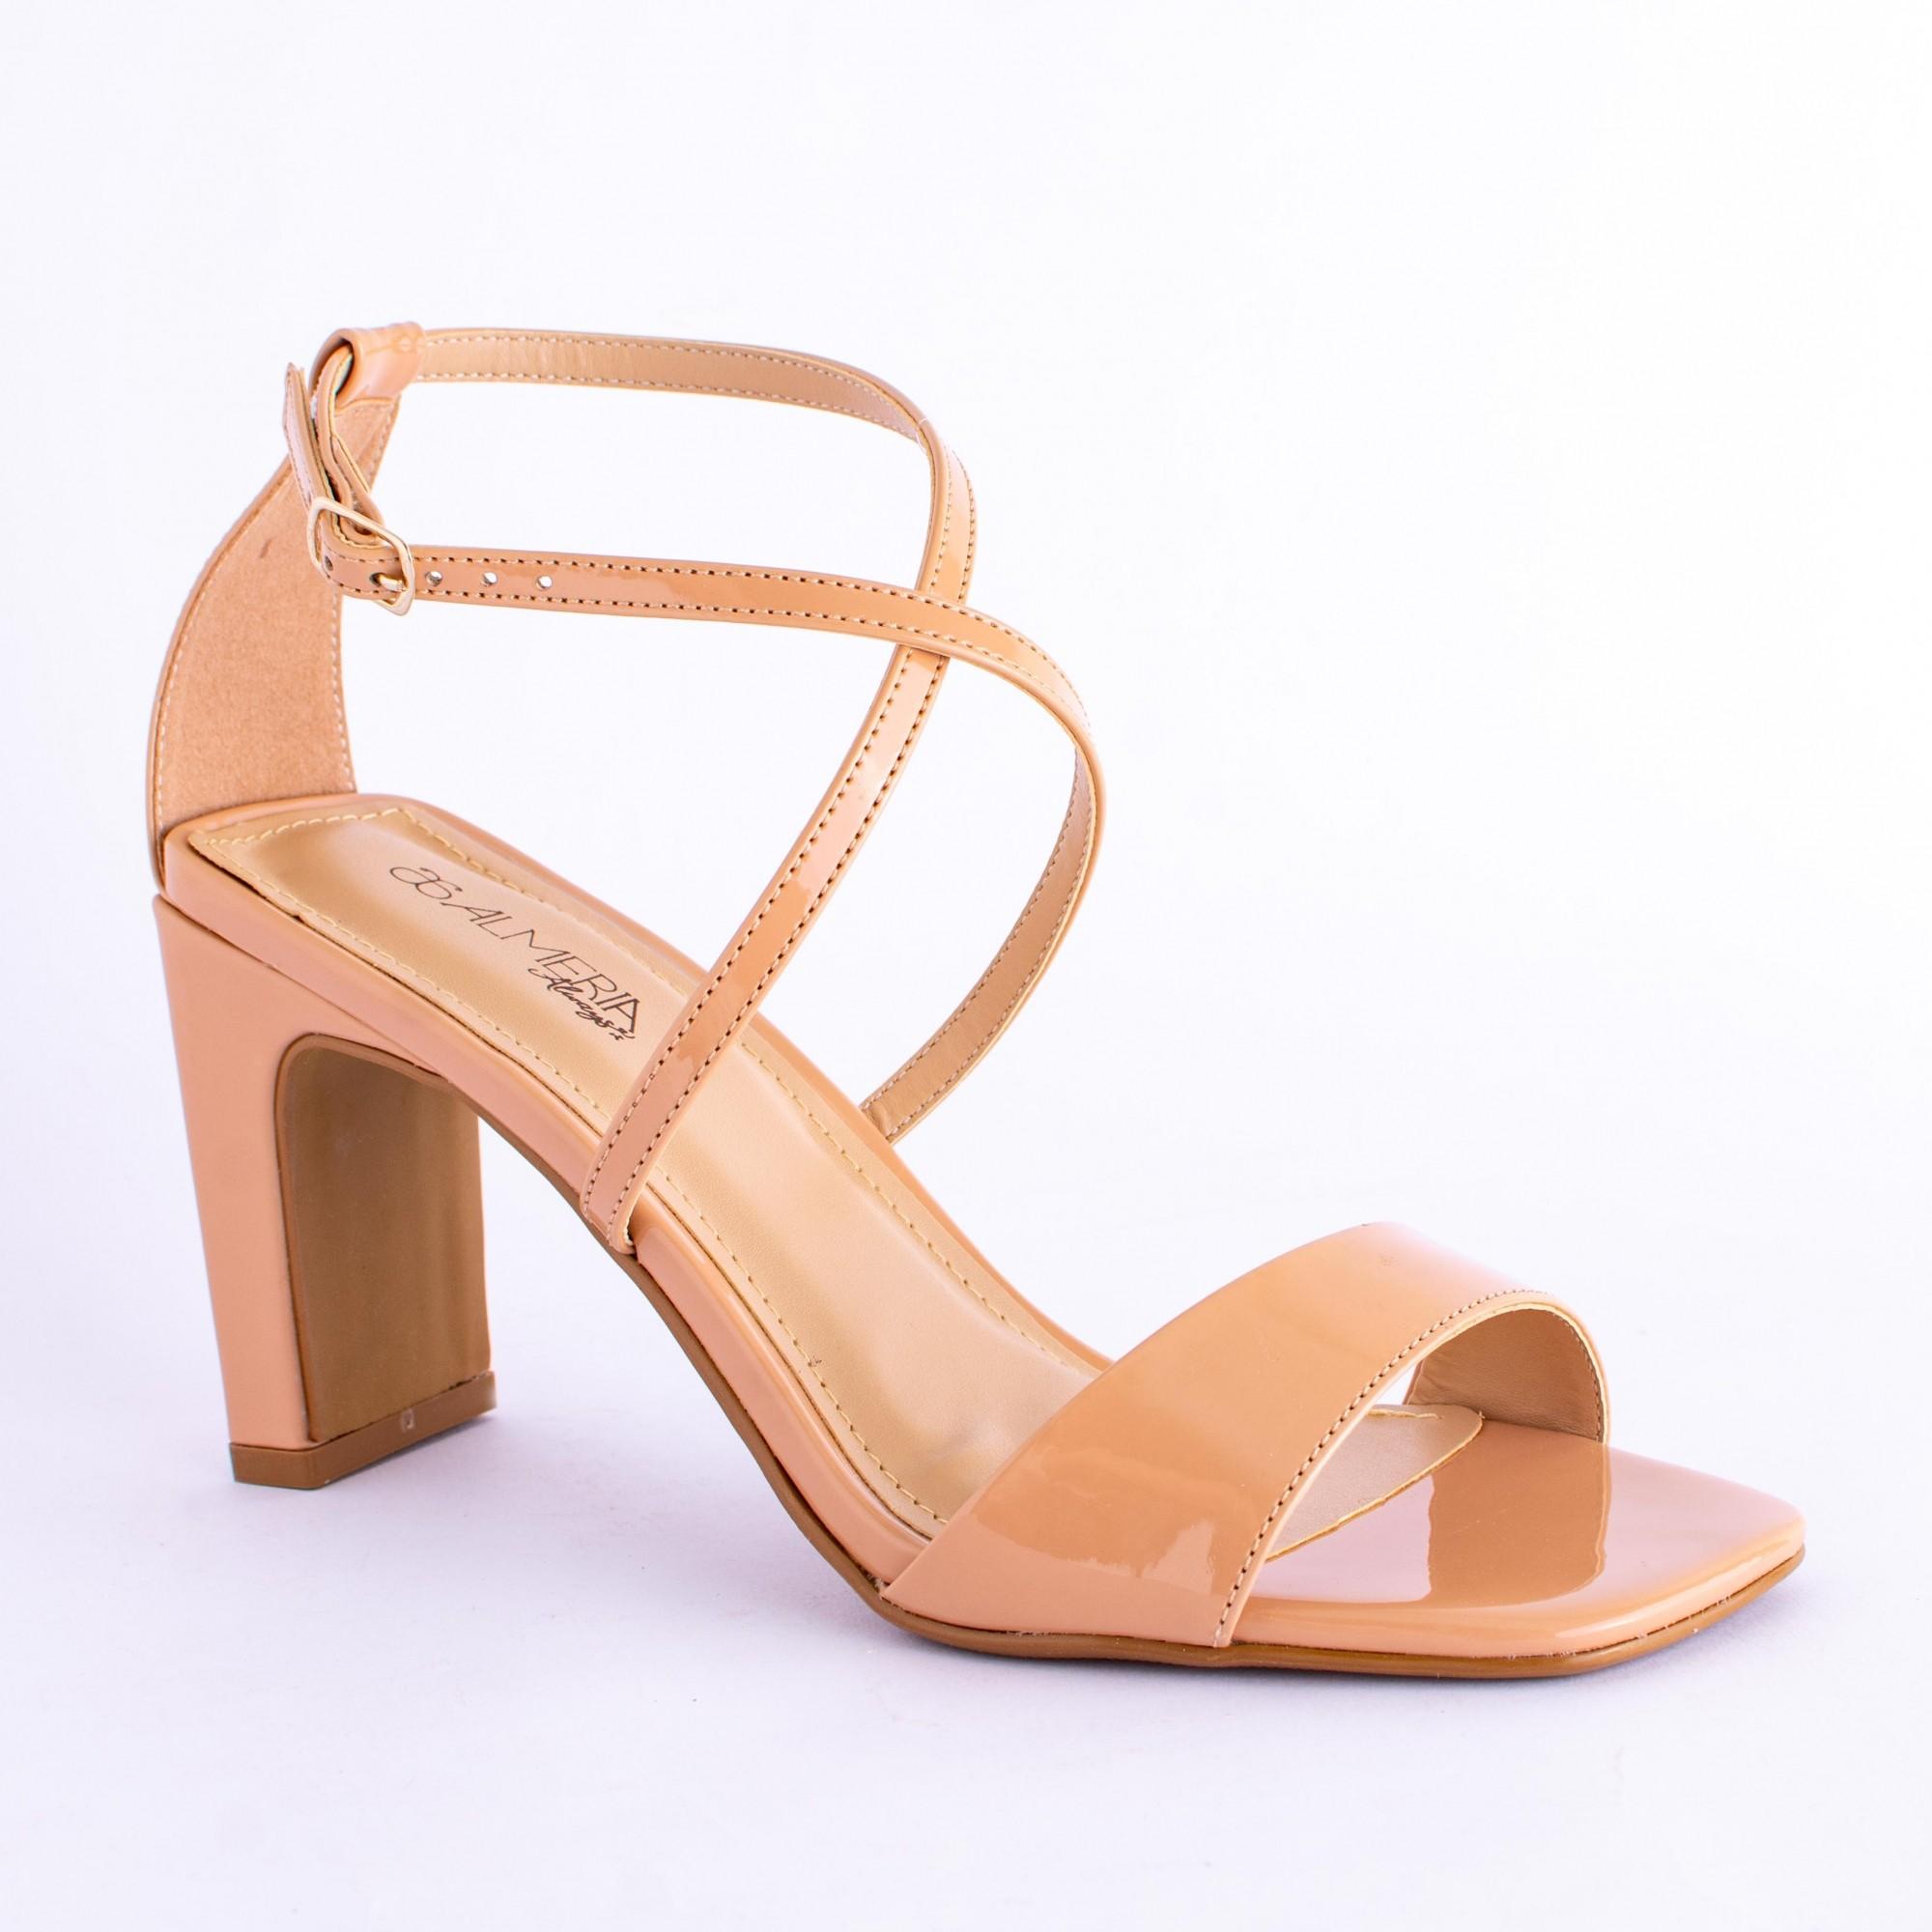 Sandália de Tiras Verniz Salto Médio